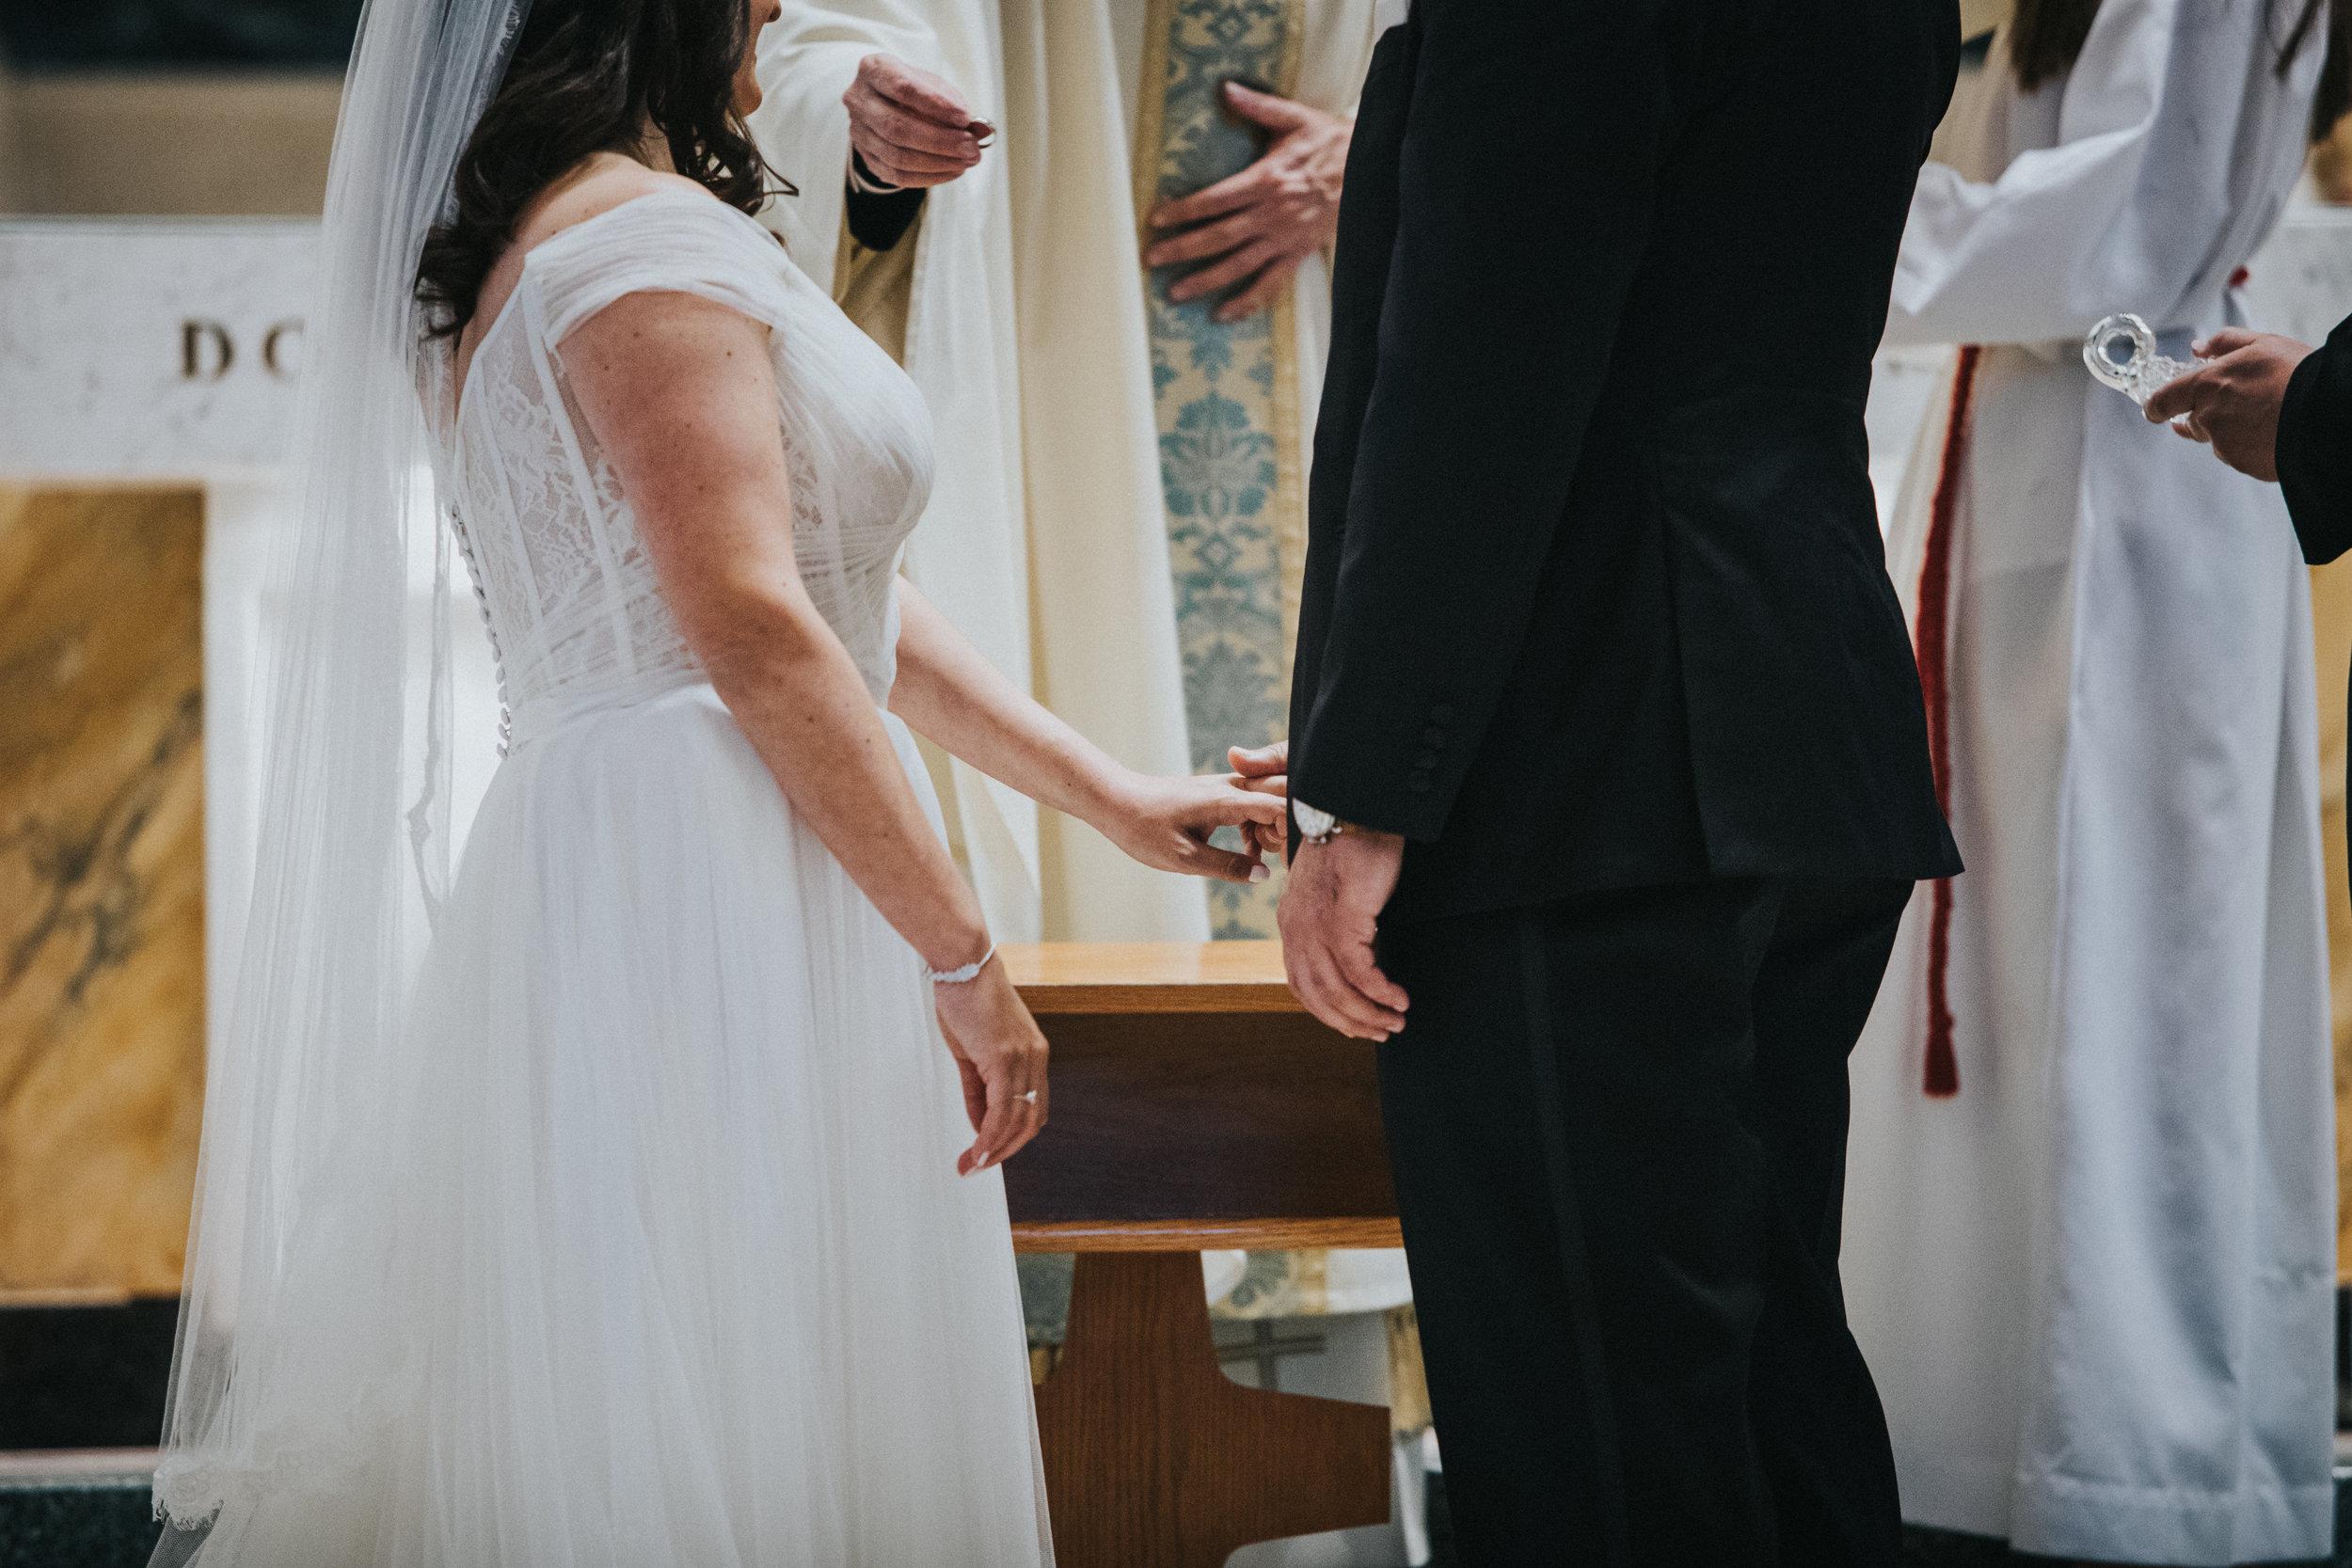 JennaLynnPhotography-NJWeddingPhotographer-Philadelphia-Wedding-ArtsBallroom-Ceremony-109.jpg